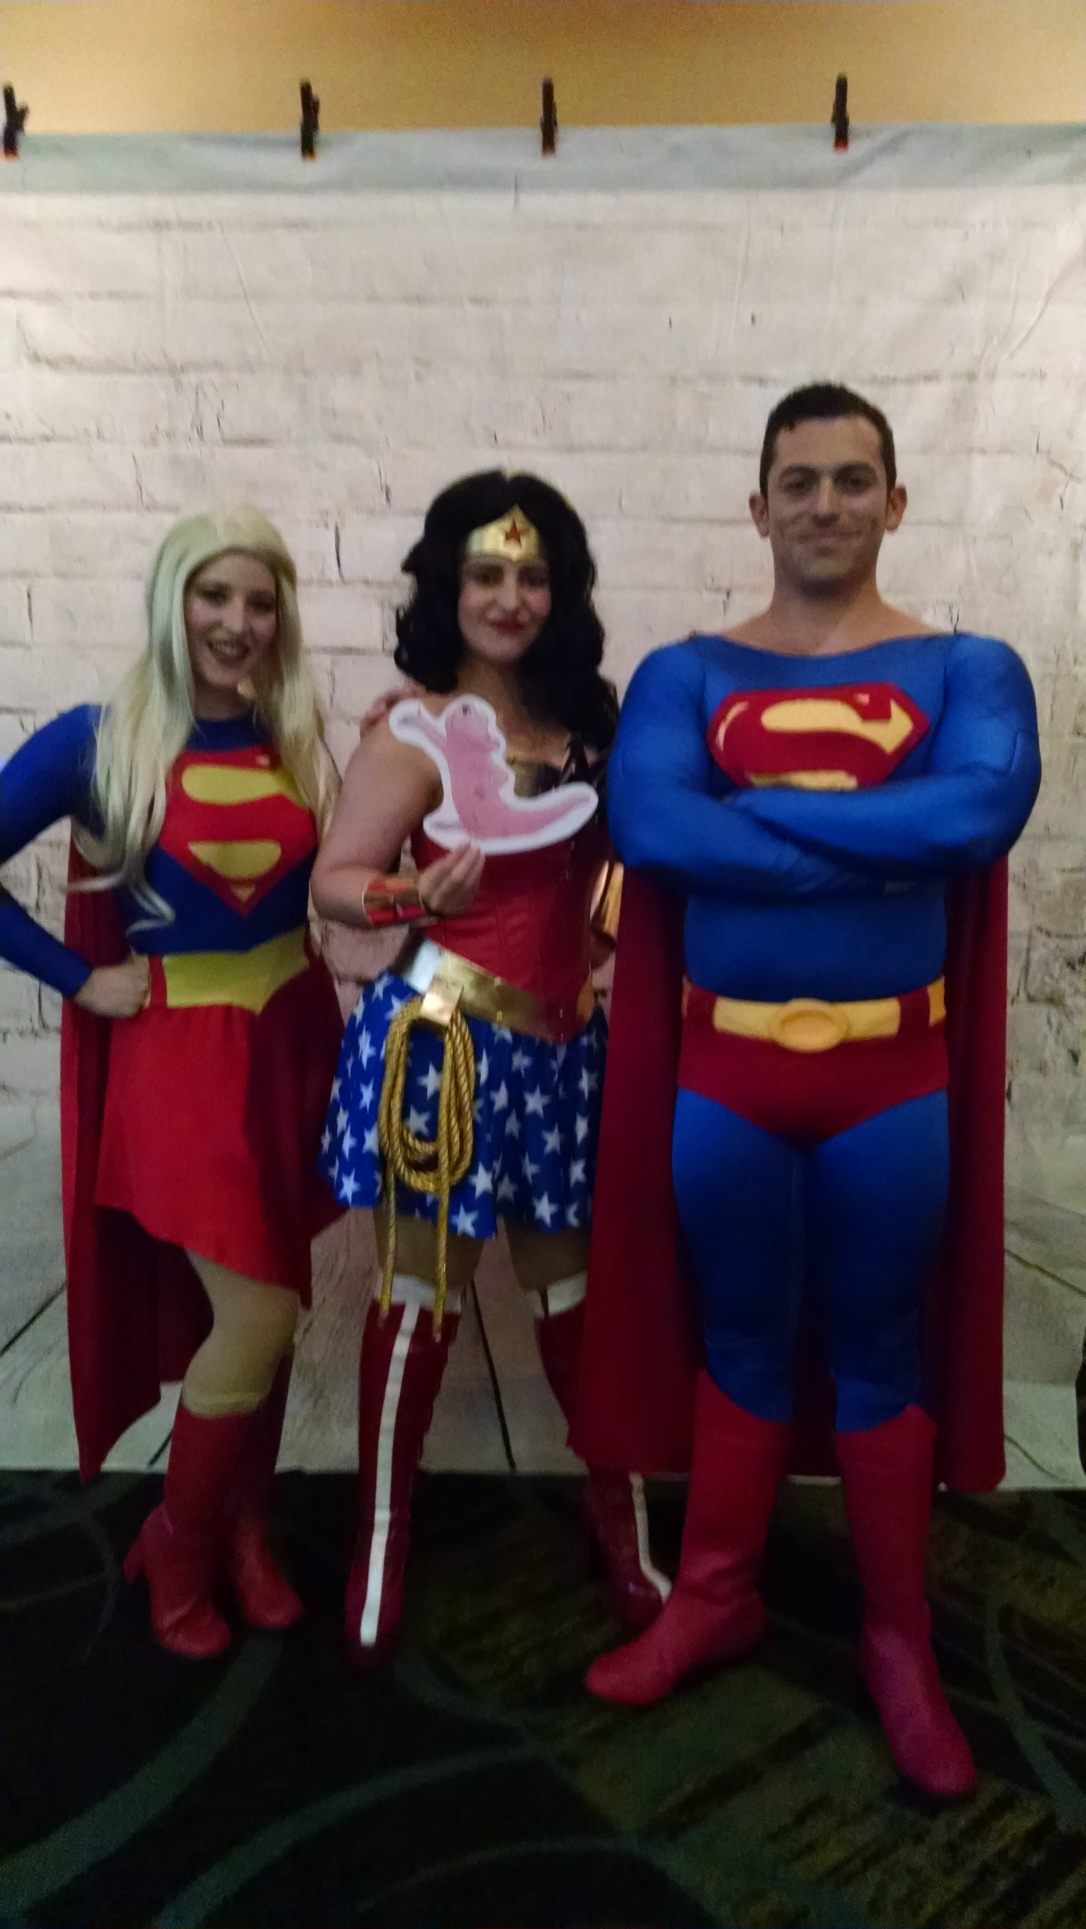 FlatRose and Super Friends Oct 2017